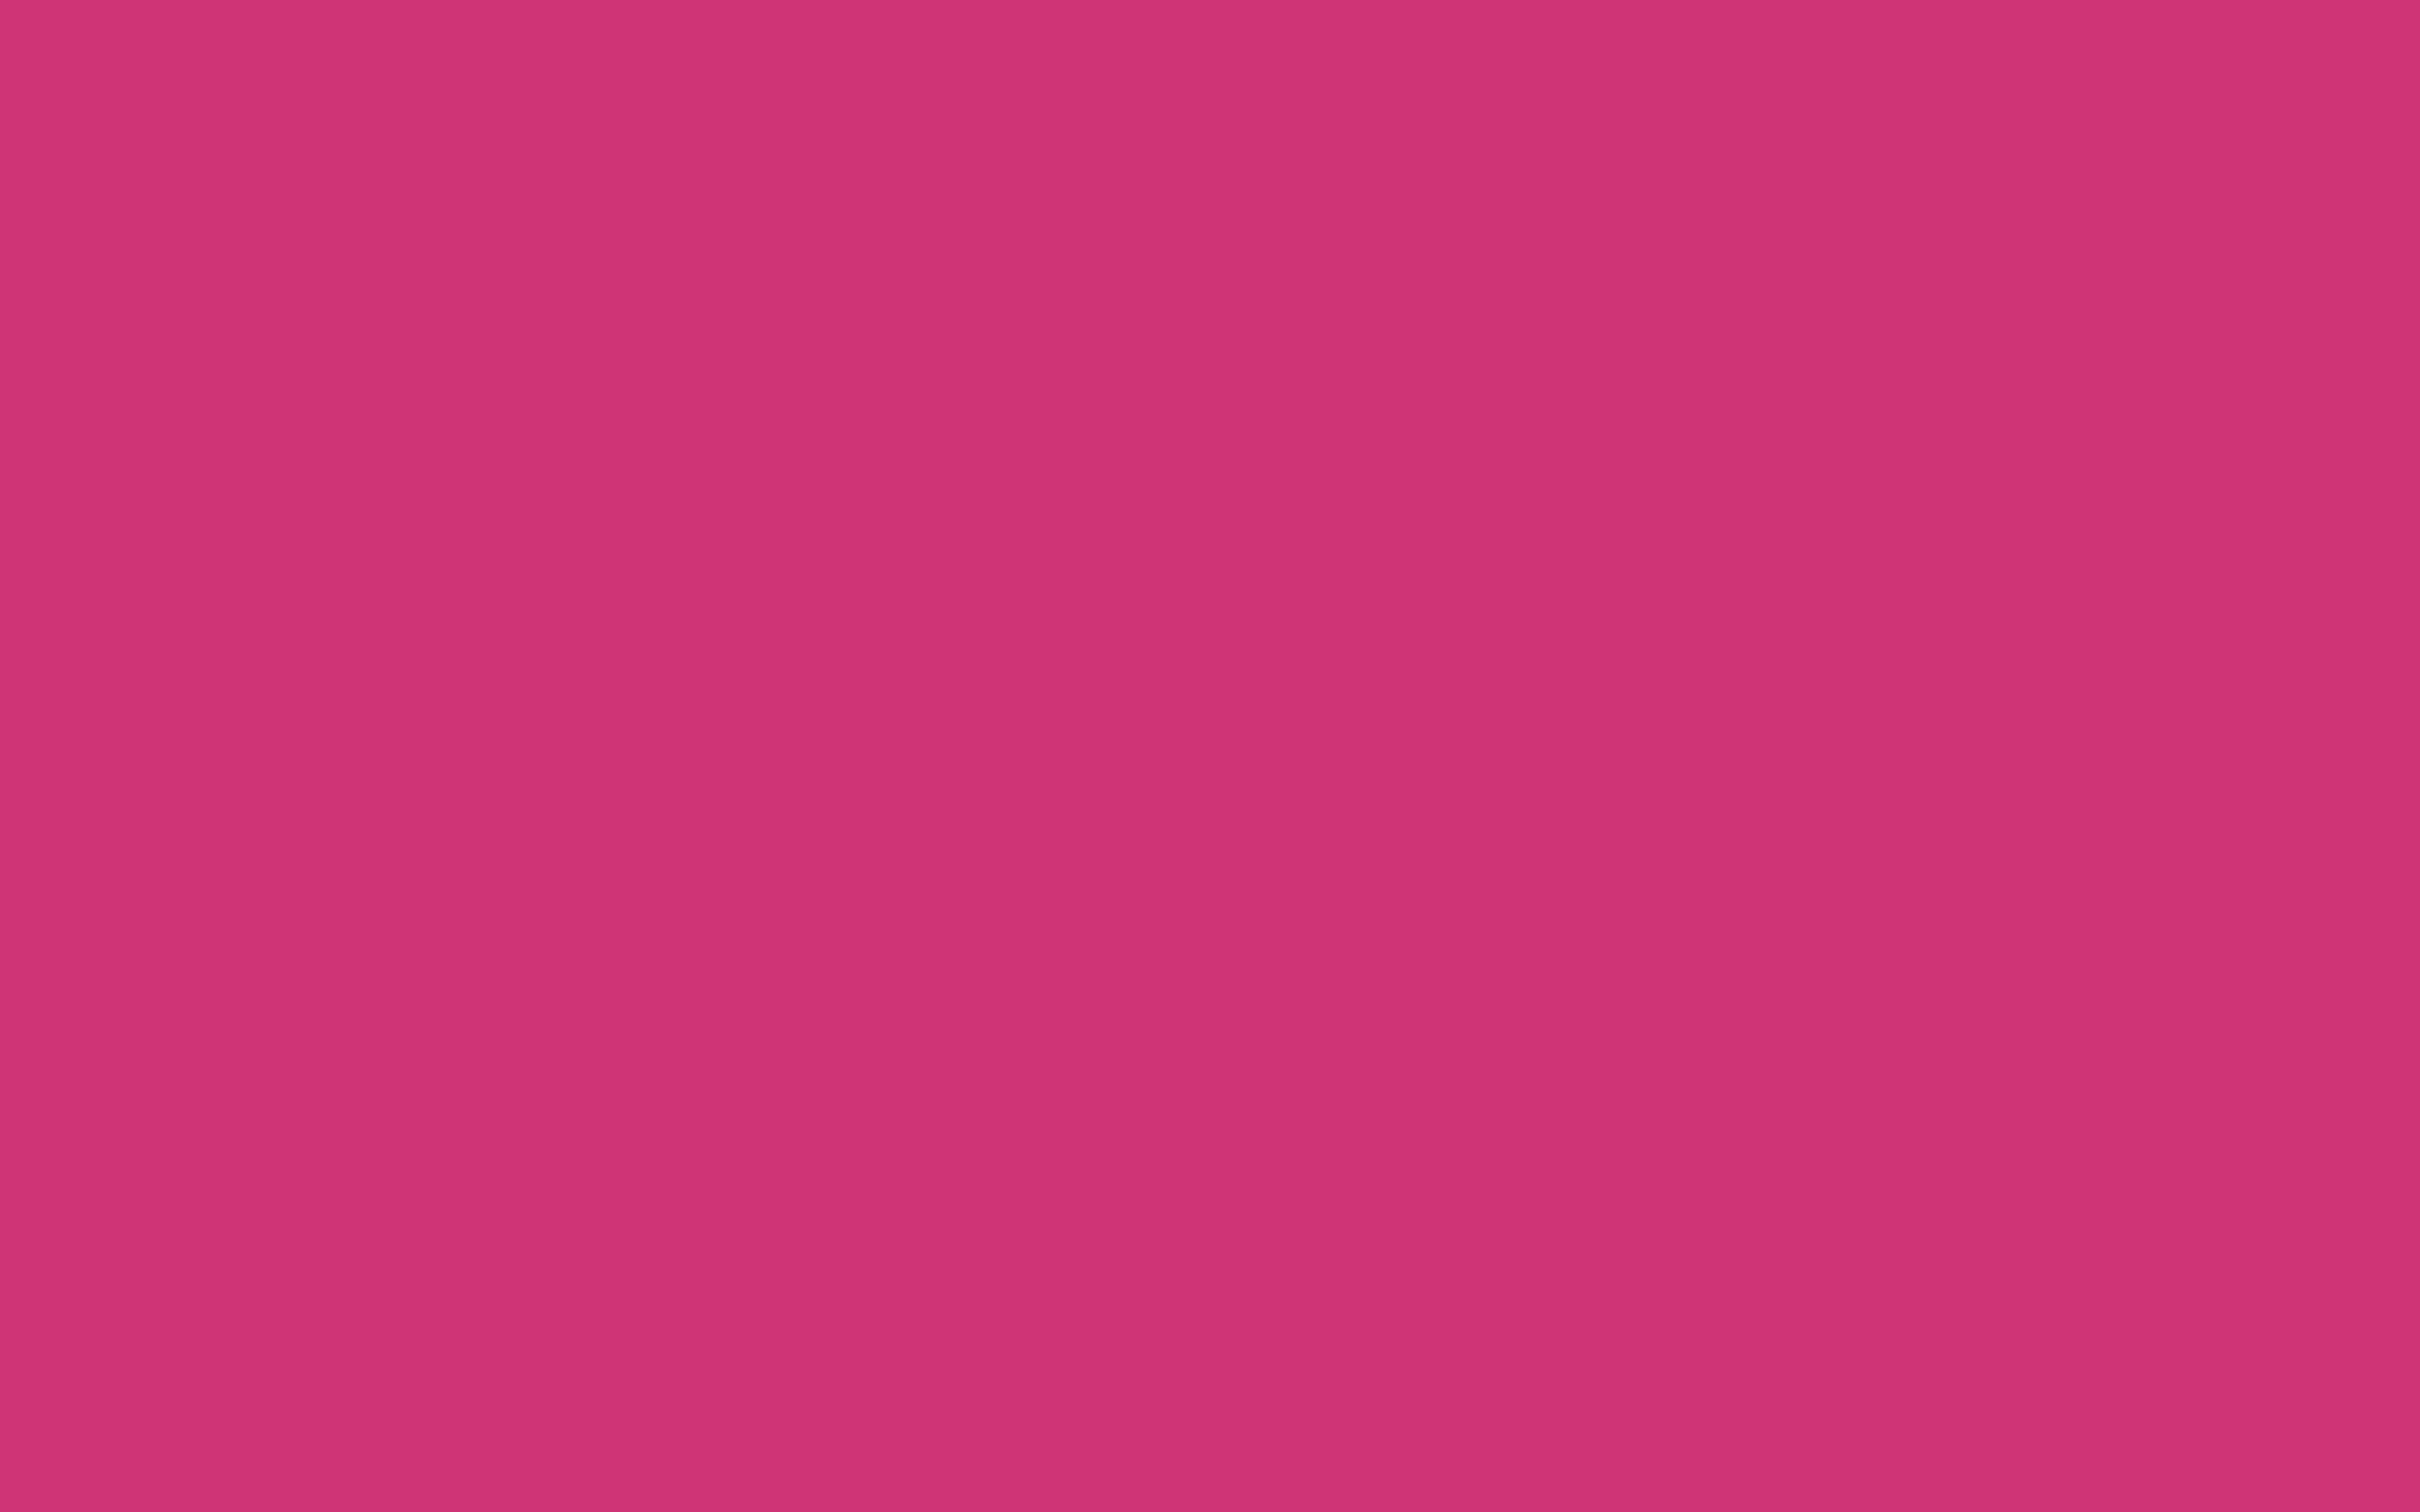 2560x1600 Telemagenta Solid Color Background